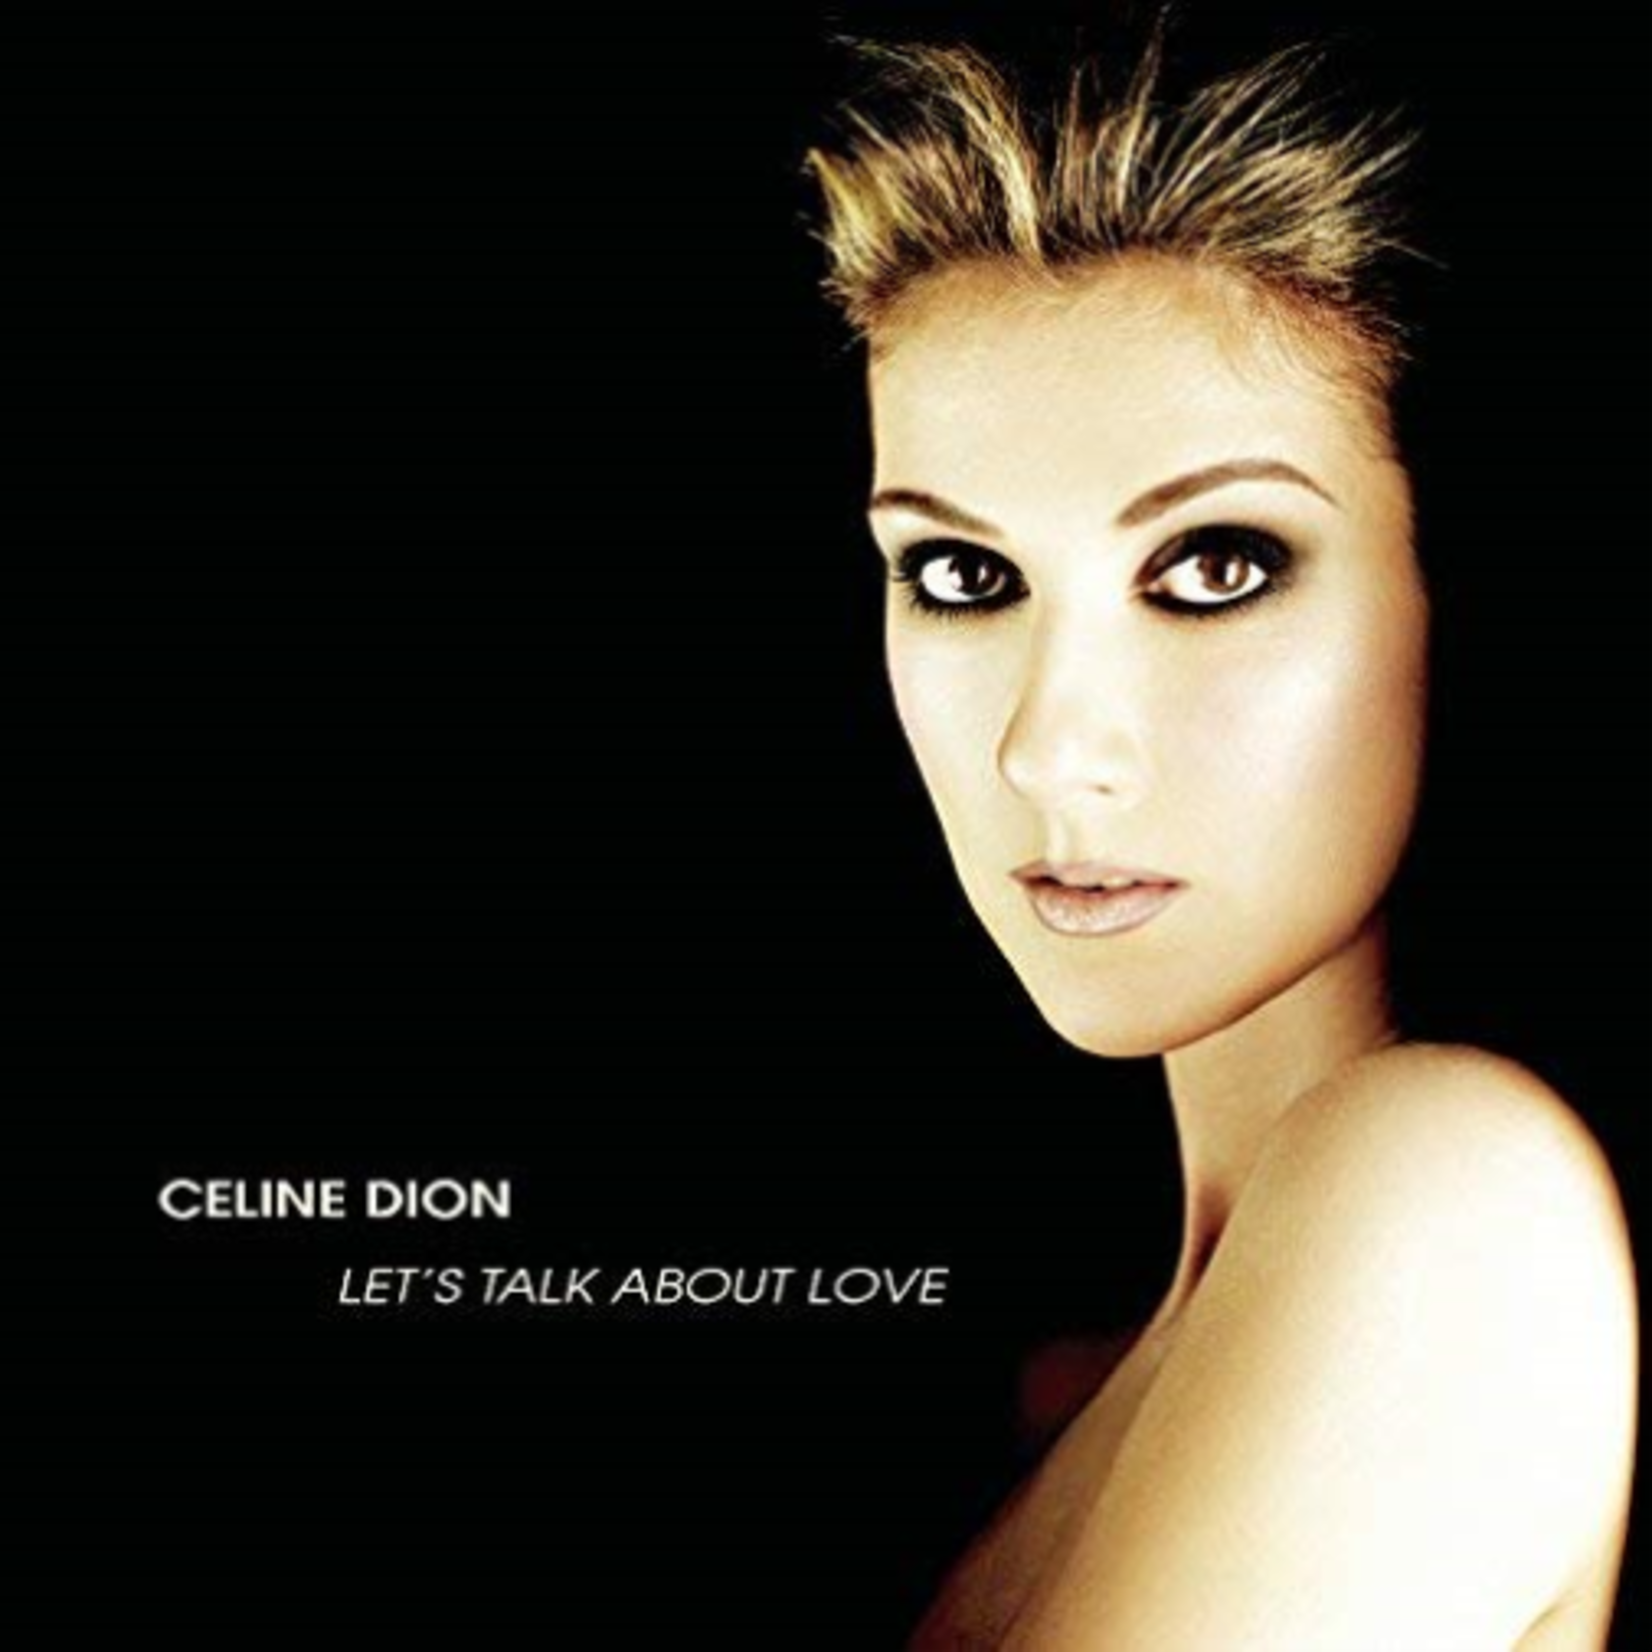 CELINE DION LET'S TALK ABOUT LOVE